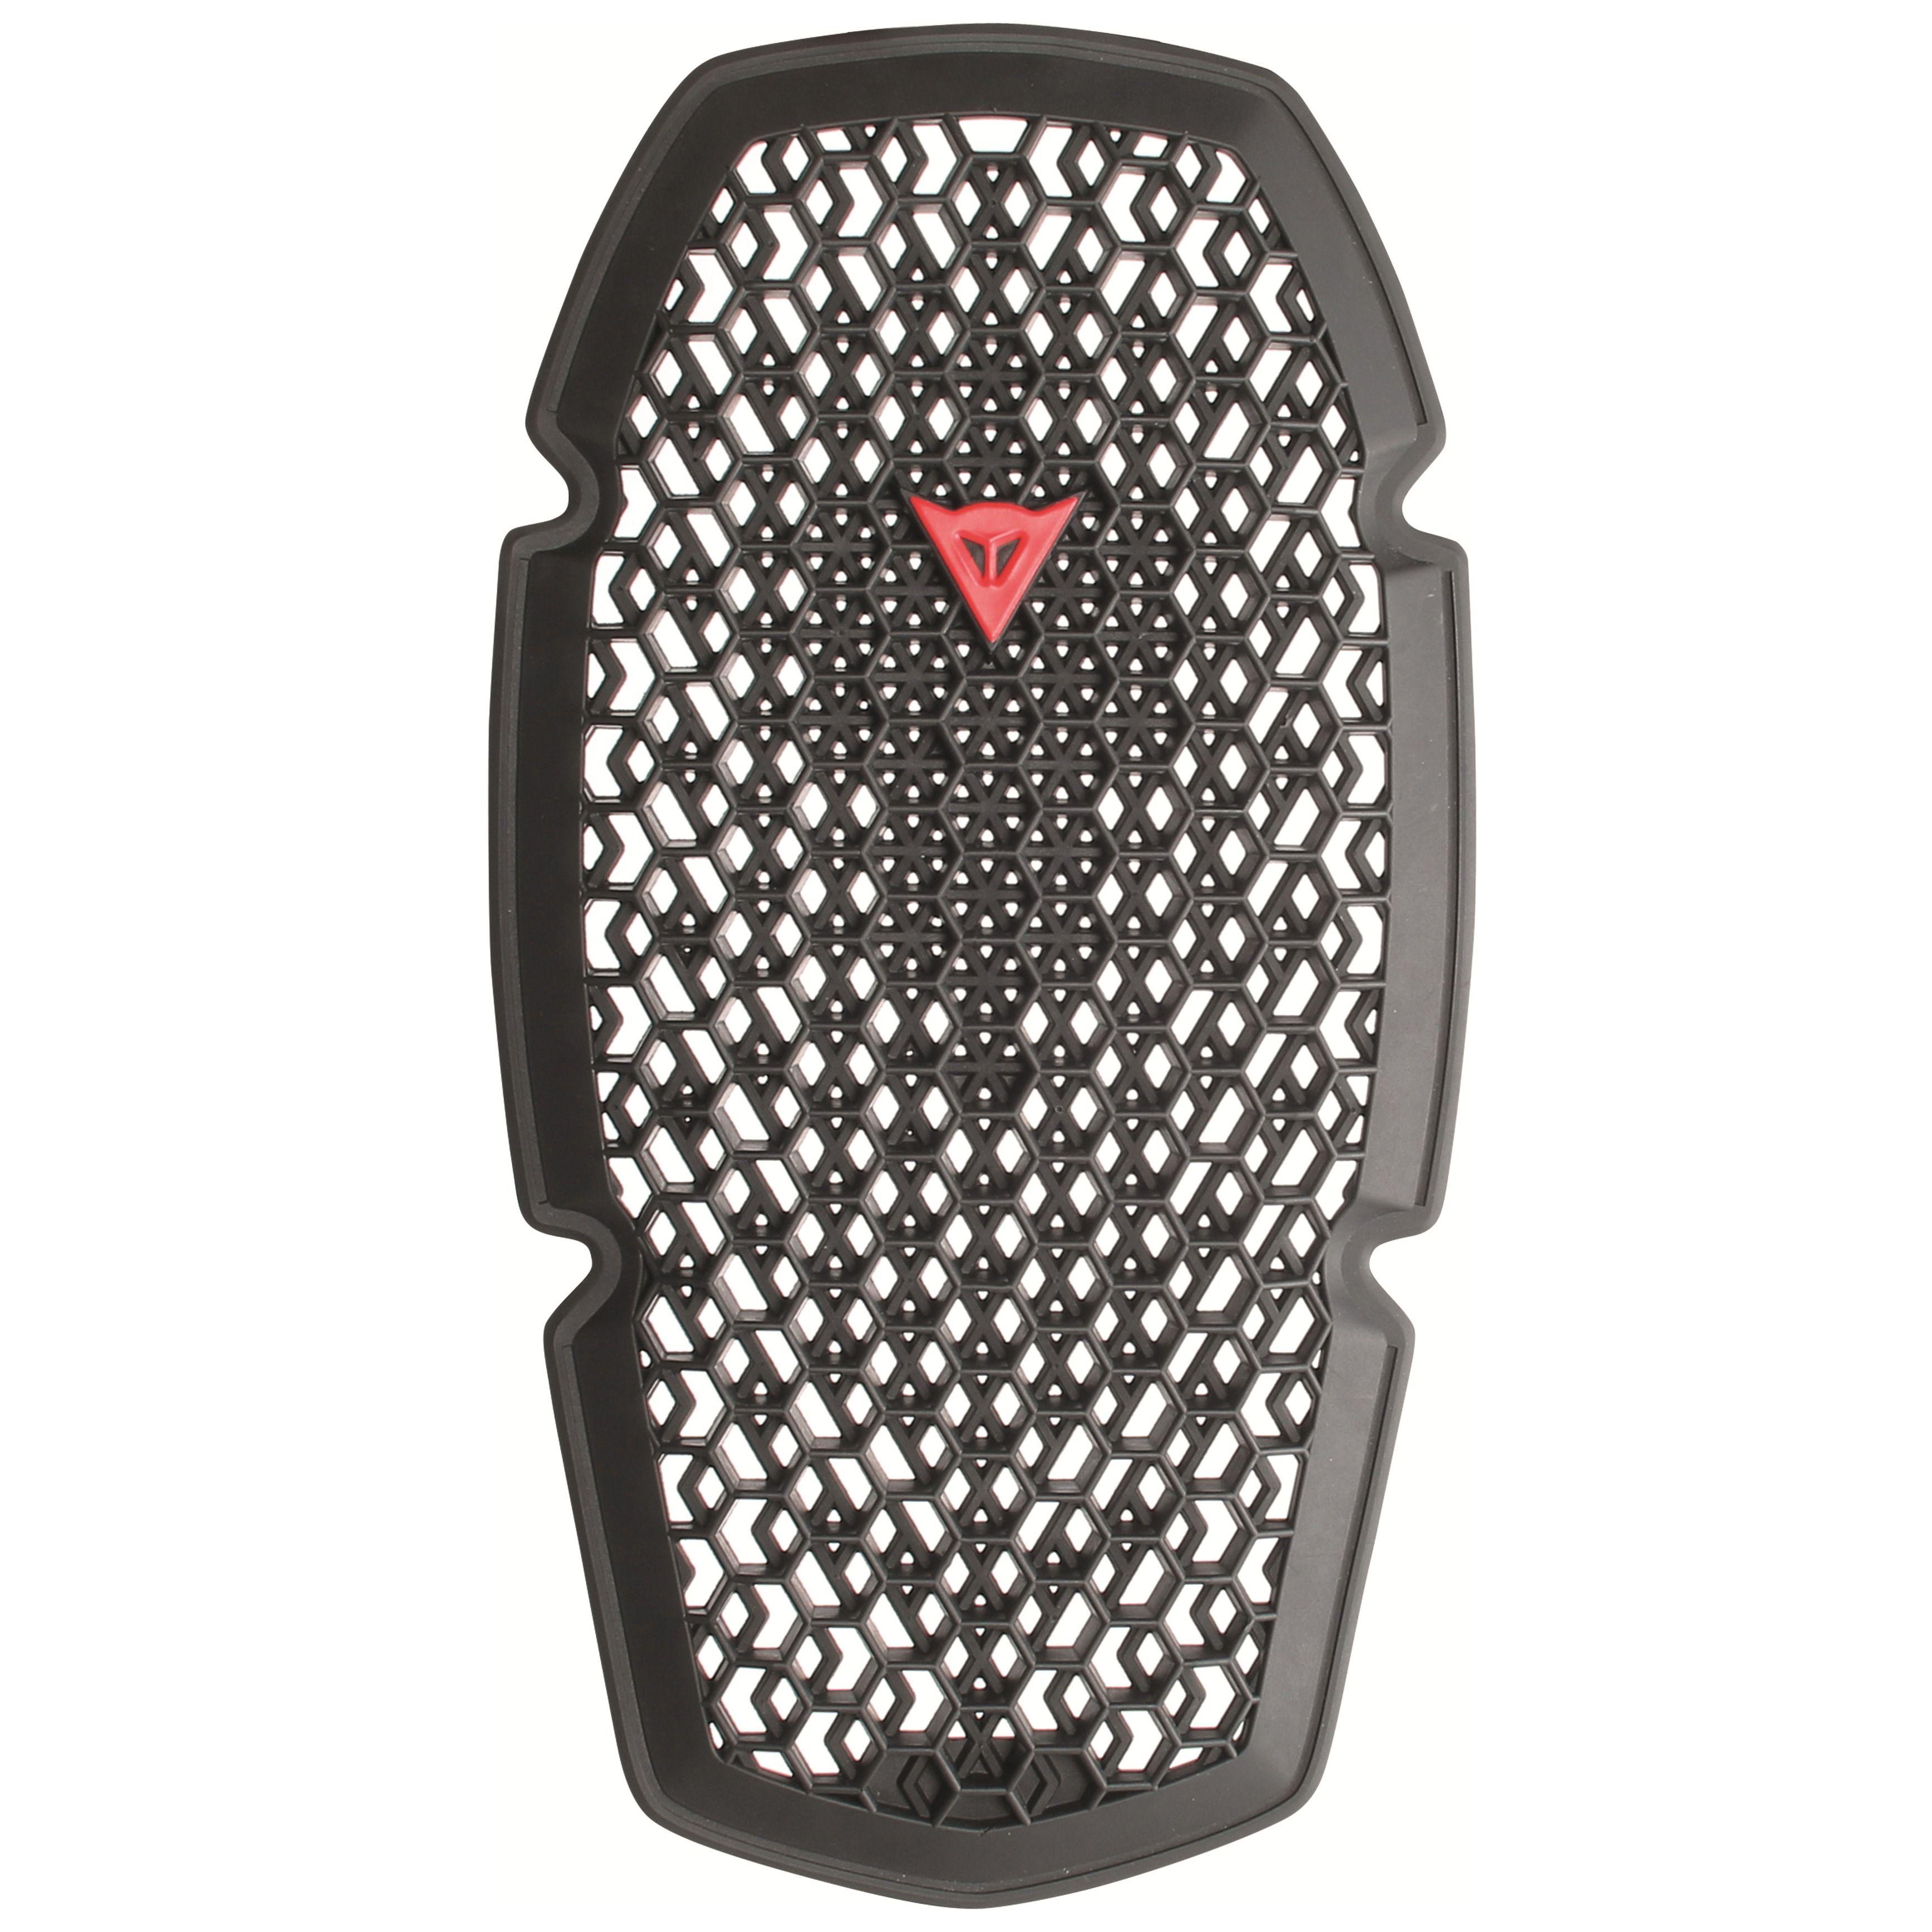 dorsale dainese pro armor g1 blouson et veste. Black Bedroom Furniture Sets. Home Design Ideas